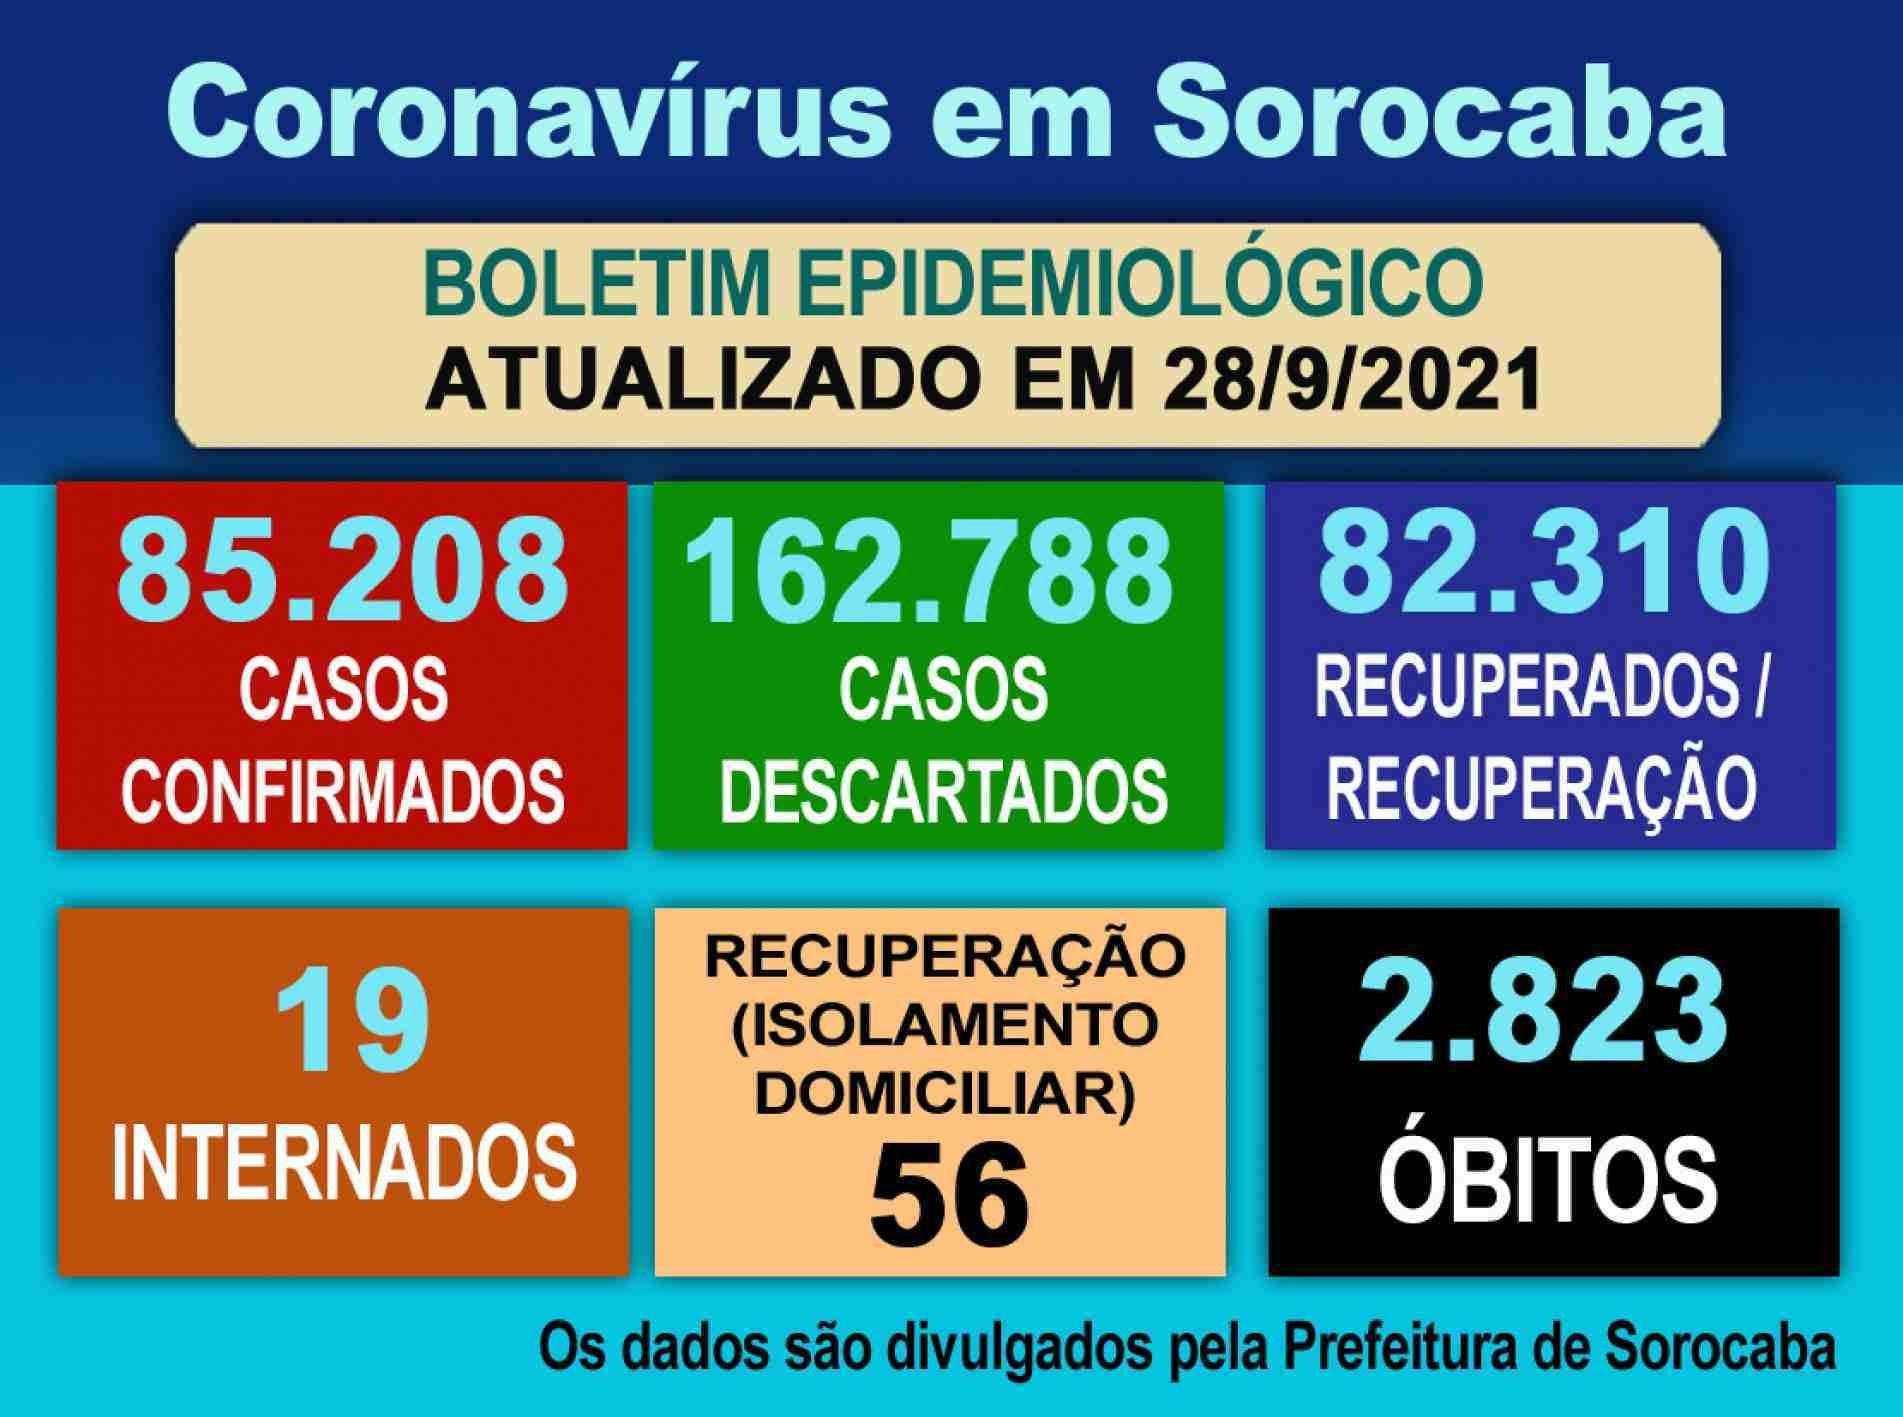 Coronavírus em Sorocaba.